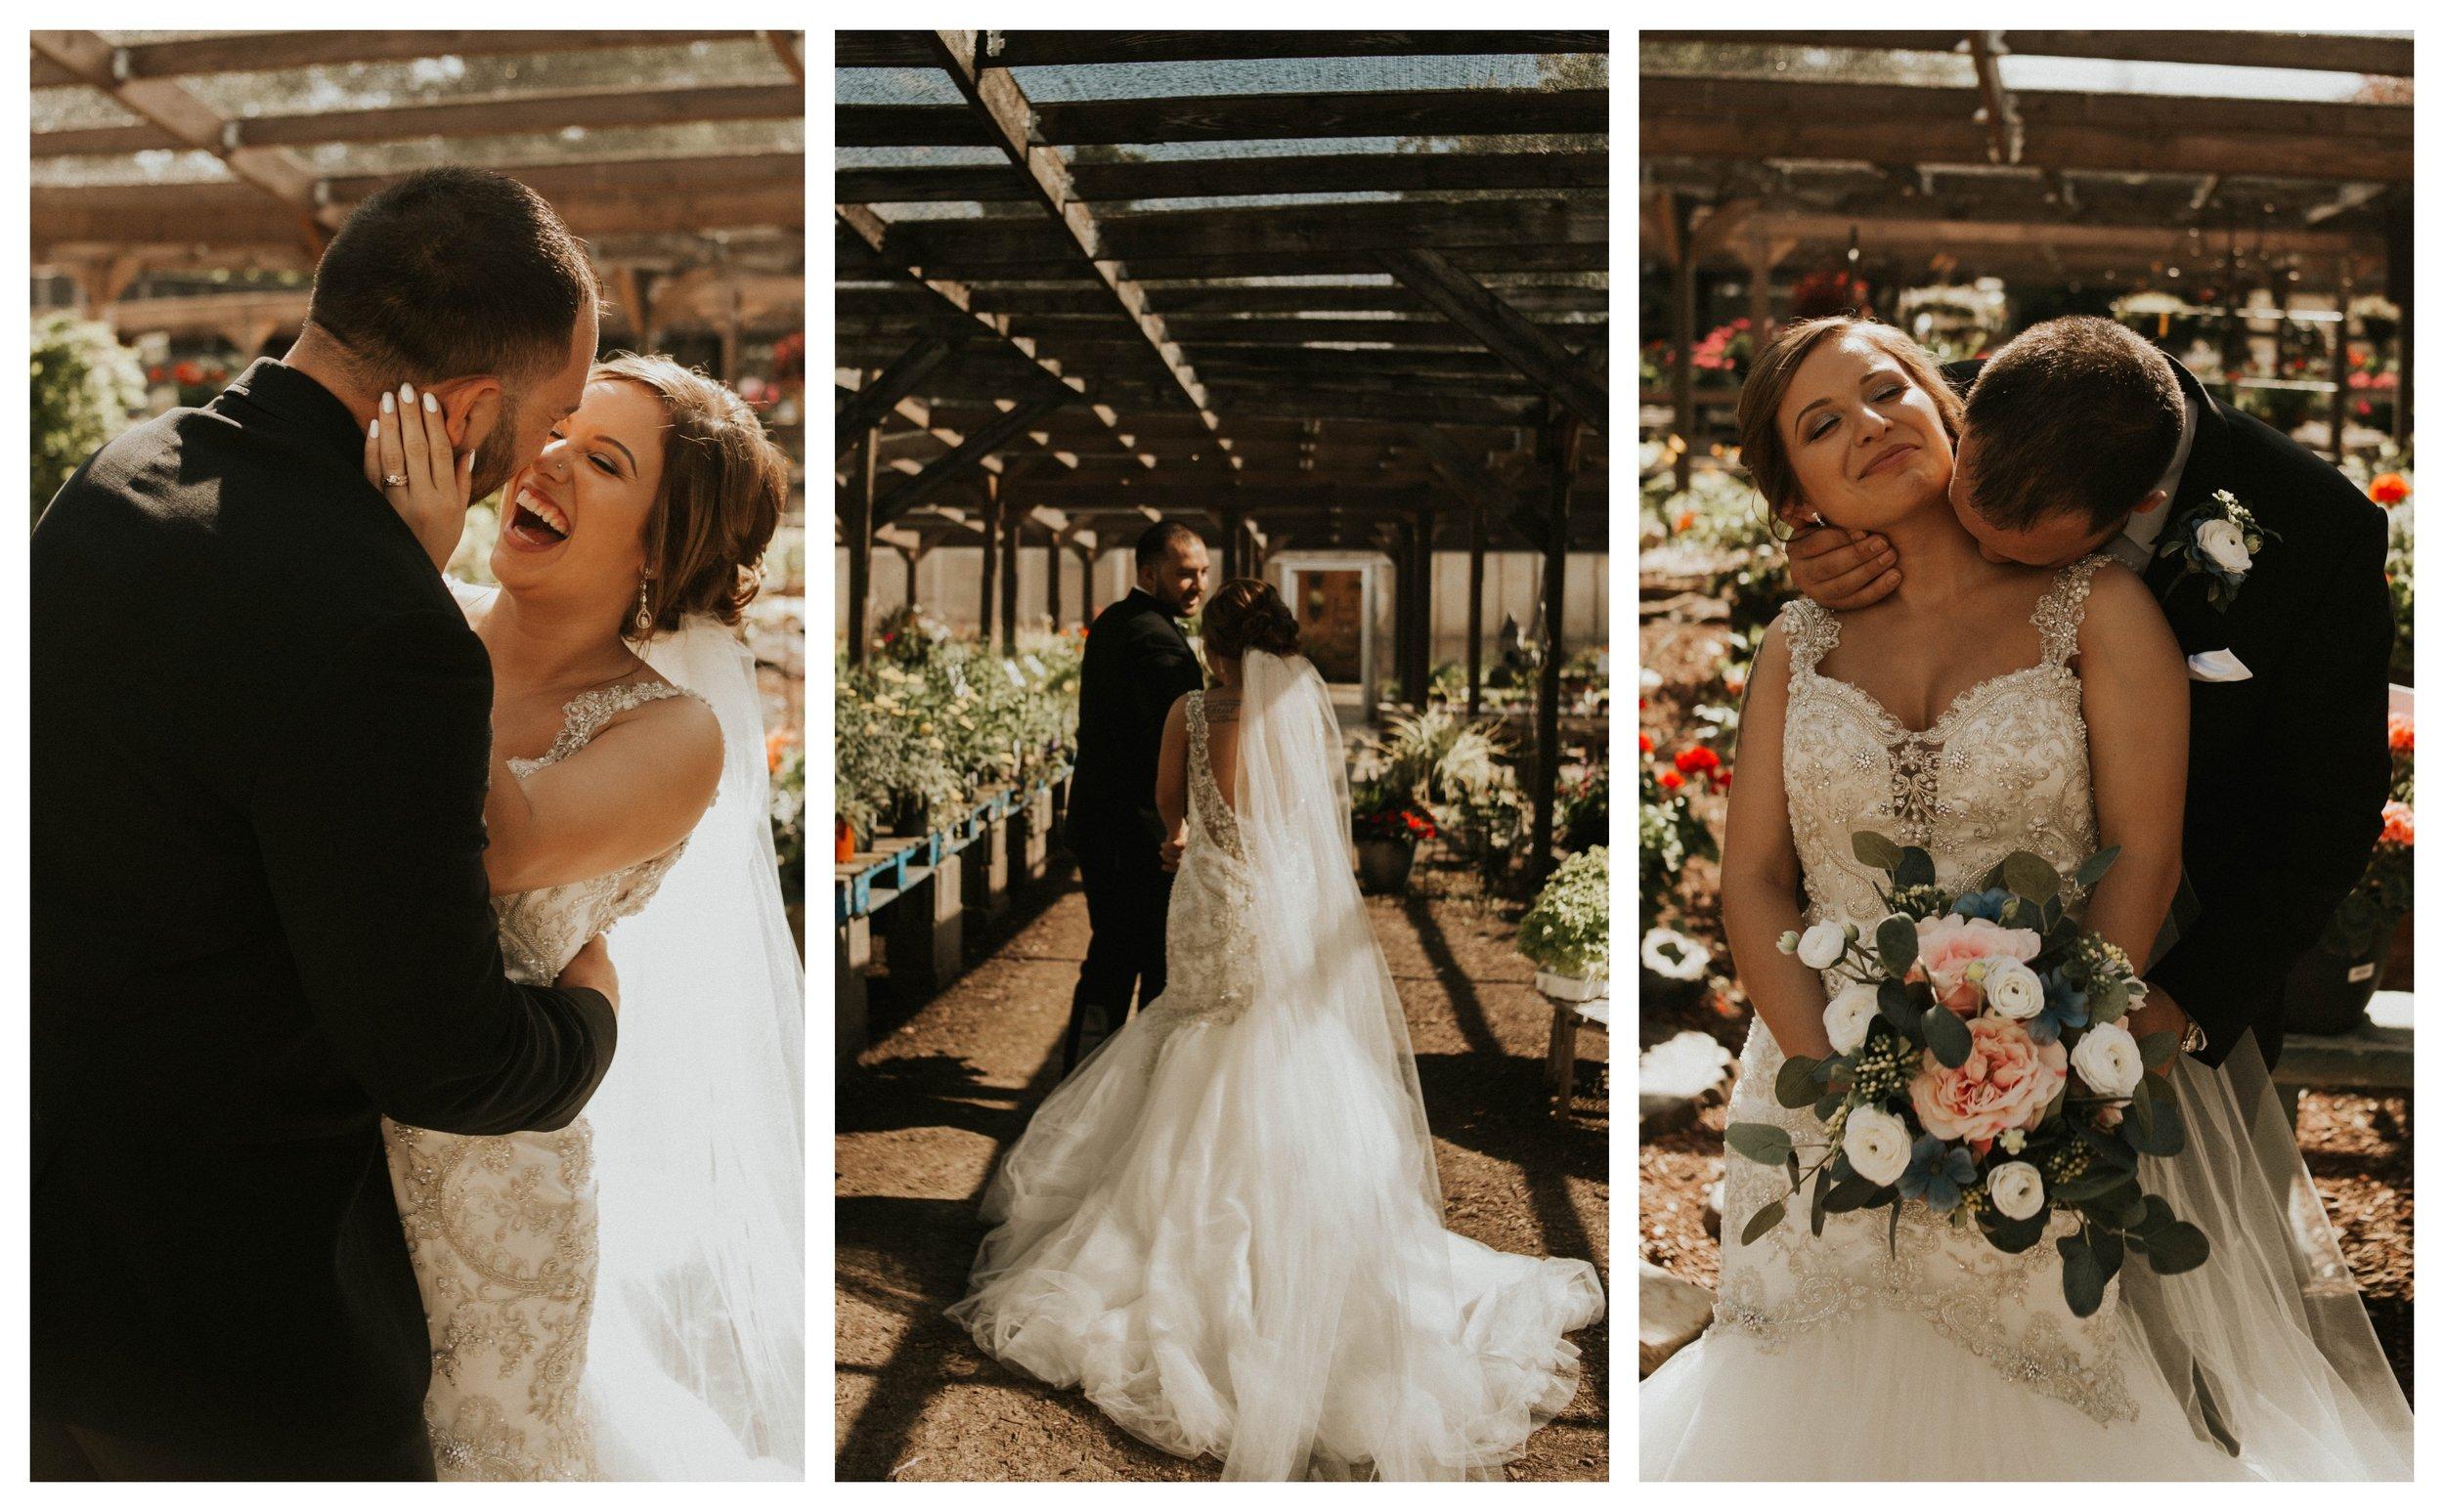 Gladys Landeros Wedding Photography